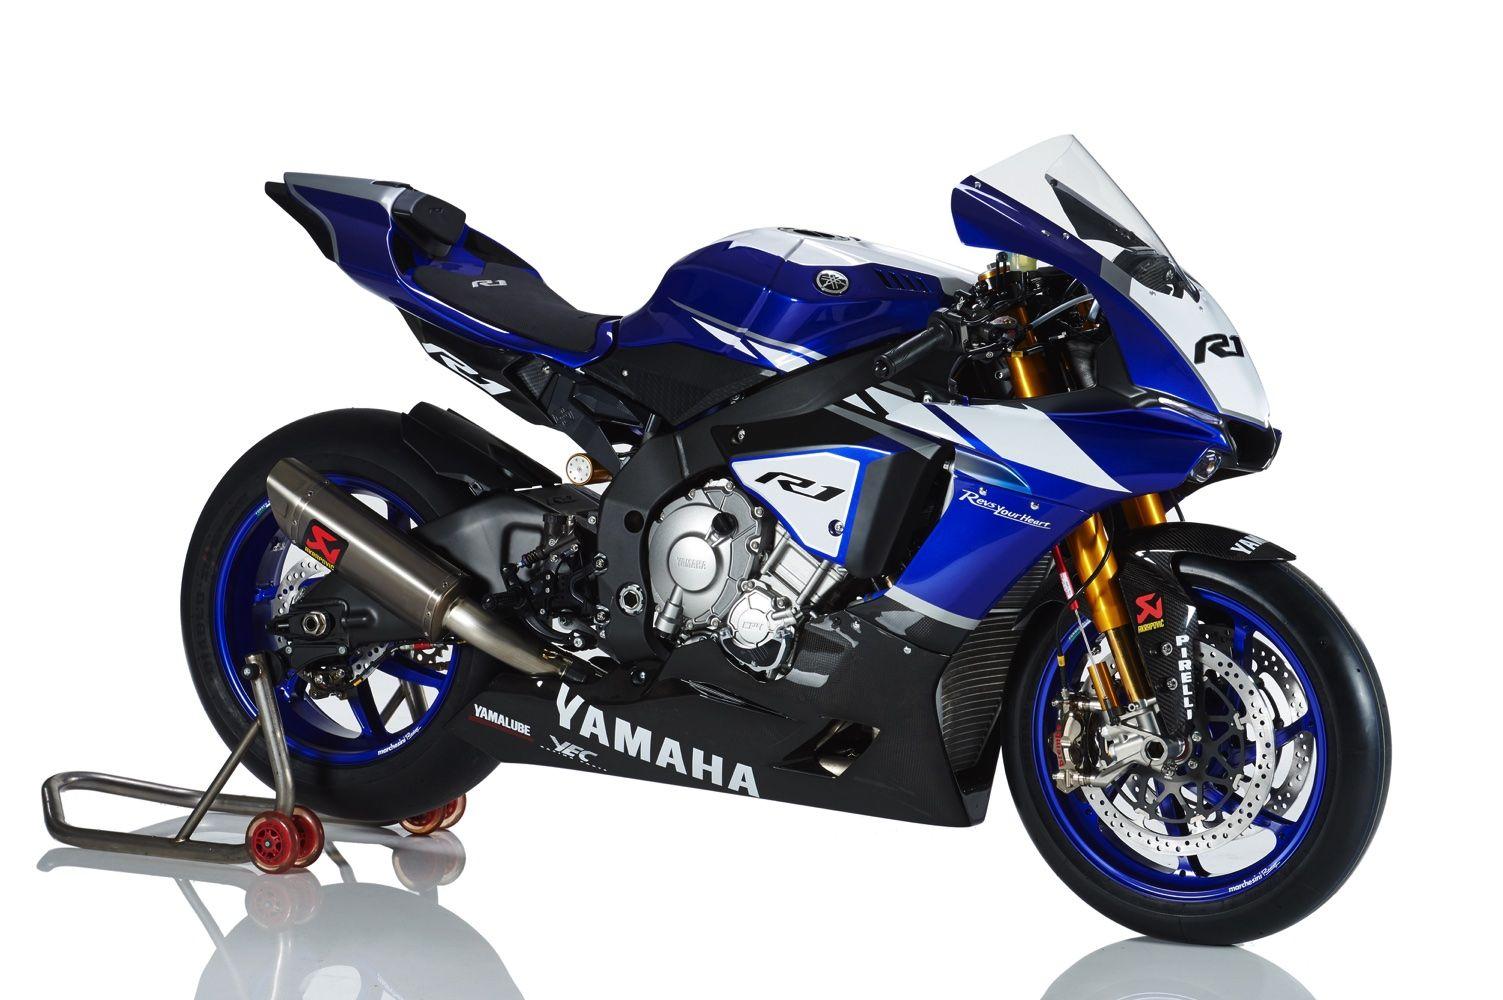 2015 Yamaha R1 Factory Akrapovic Exhaust